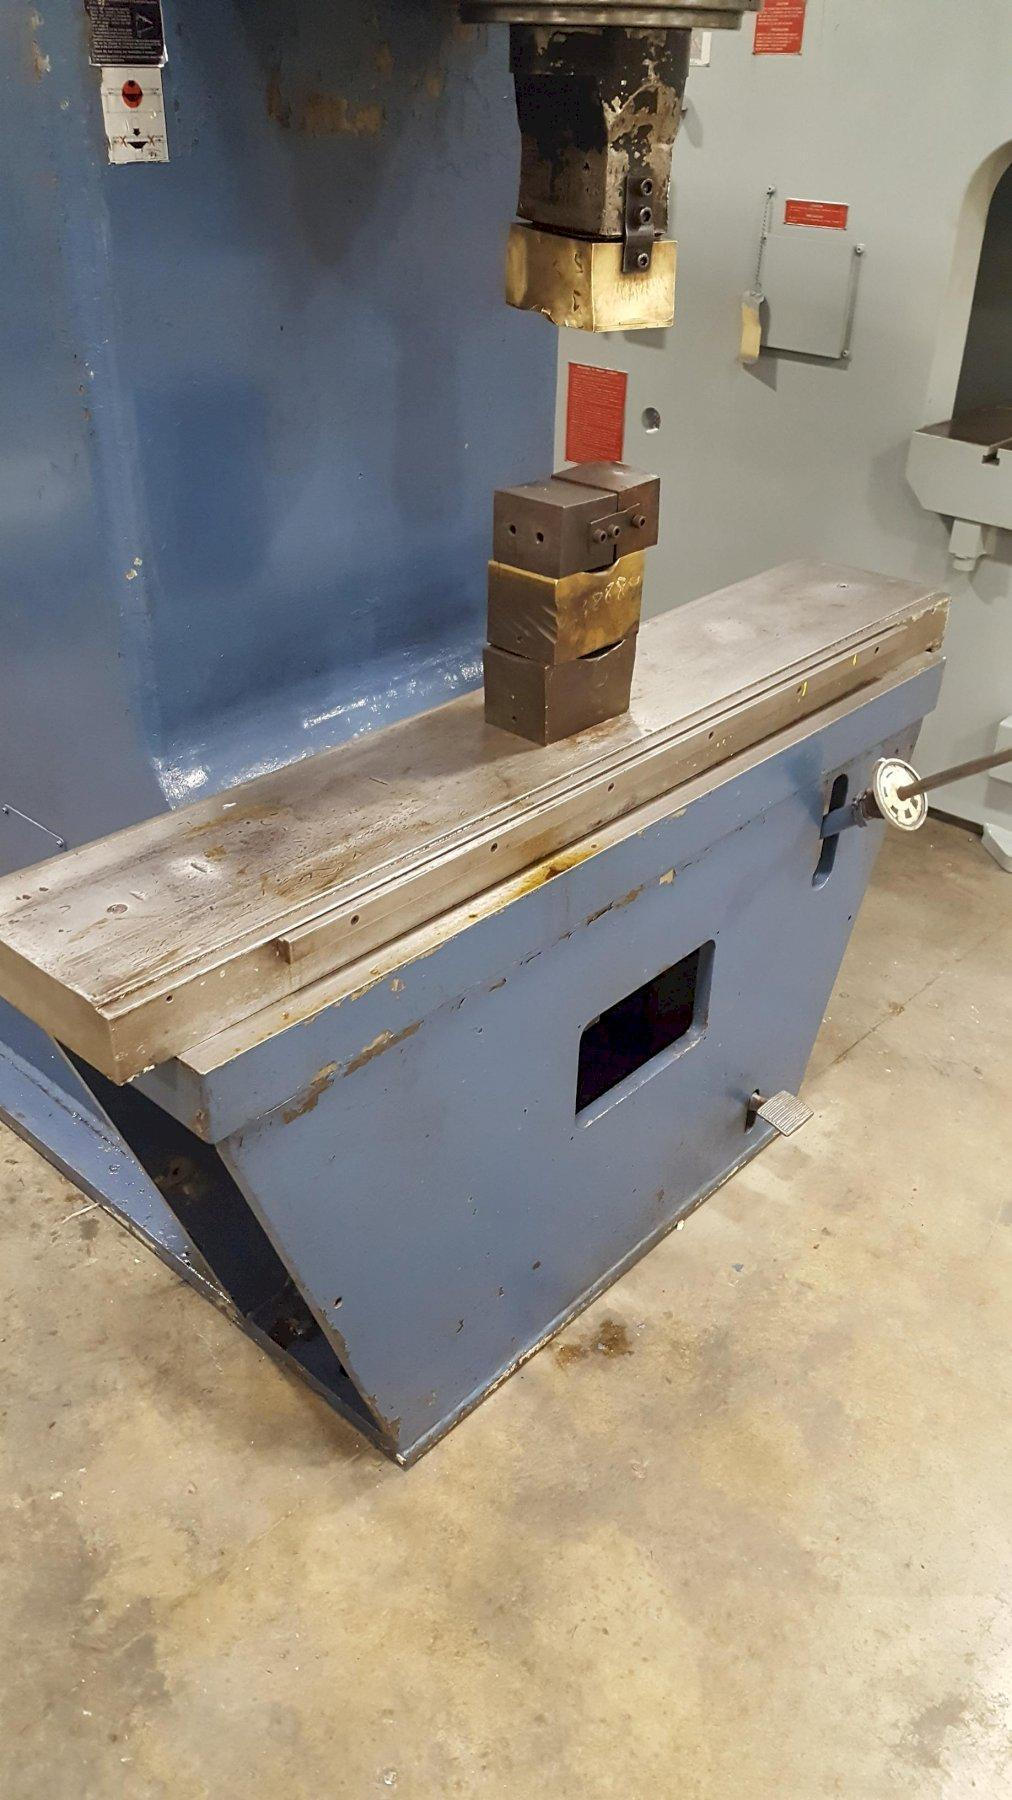 Eitel Model RP-200 Straightening Press